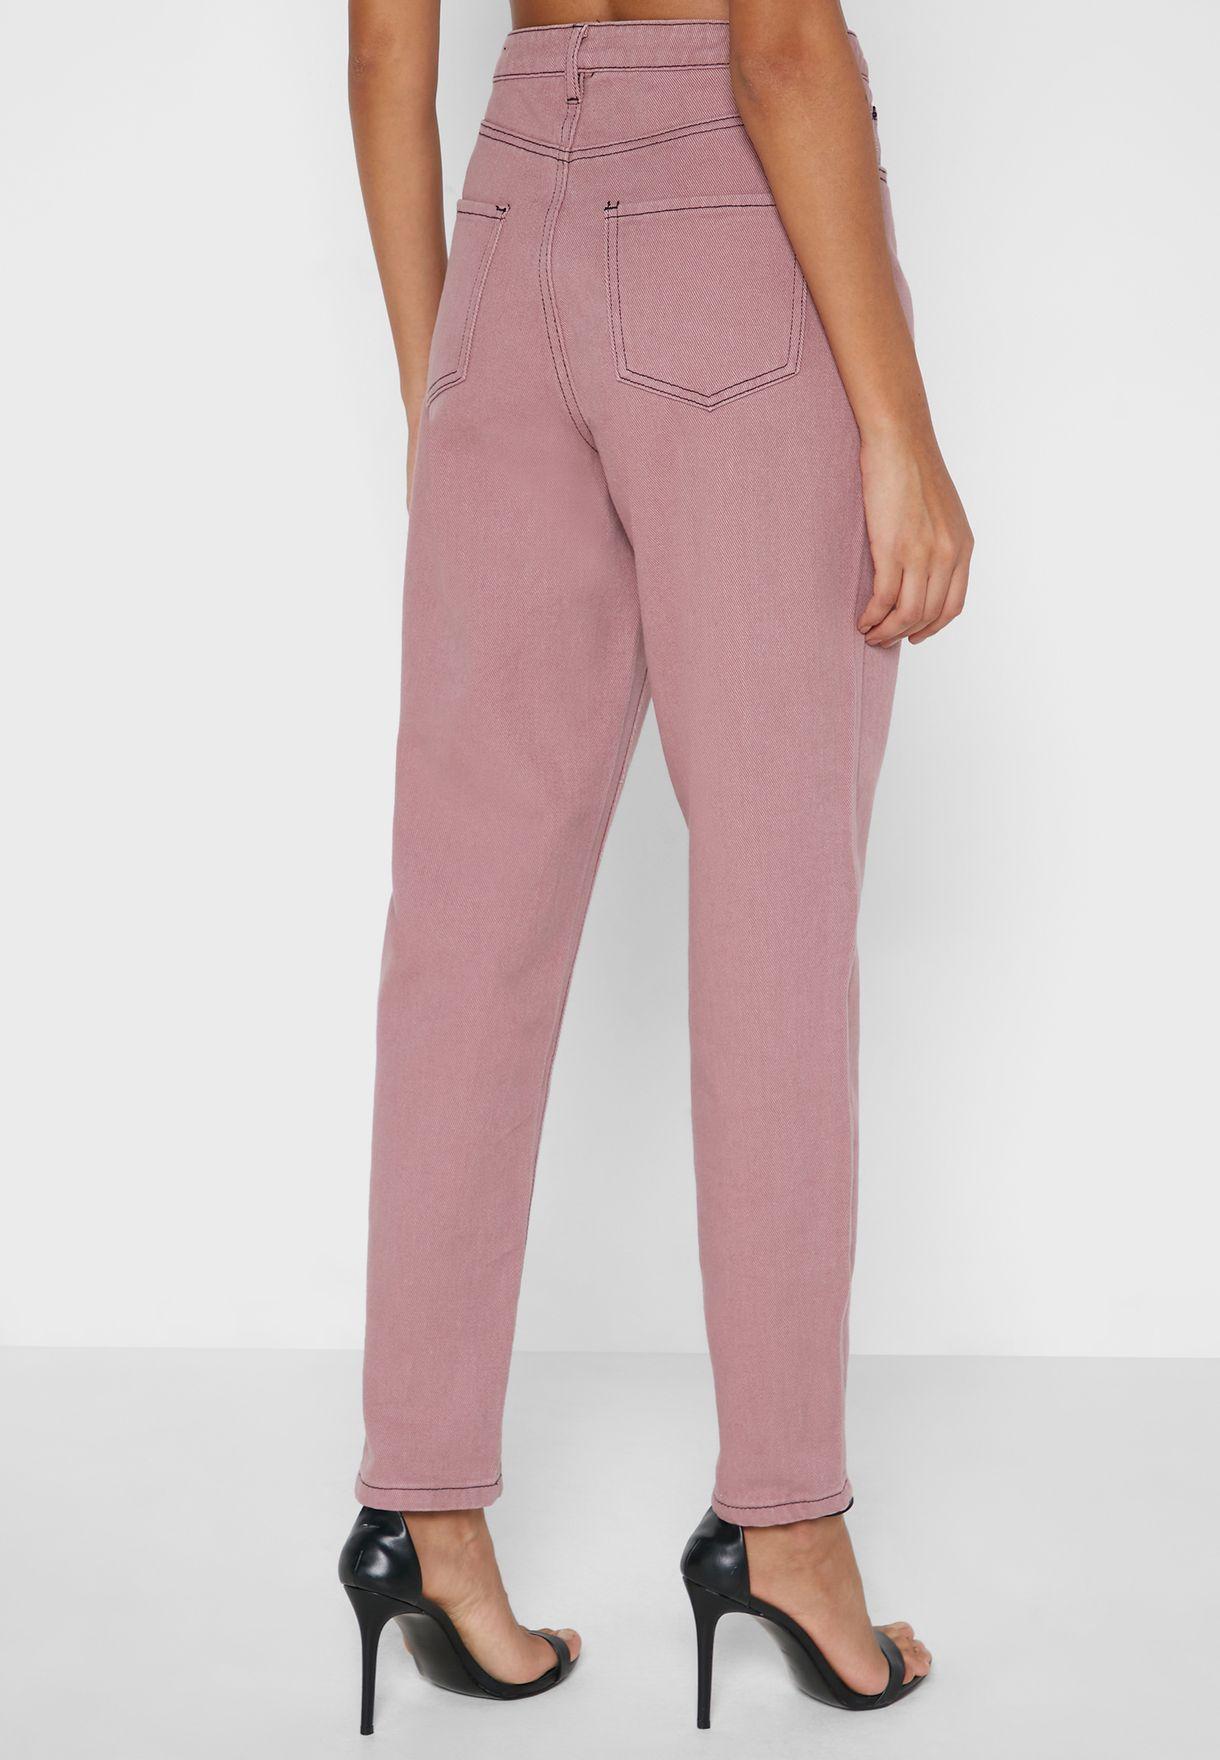 Contrast Stitch Straight Jeans